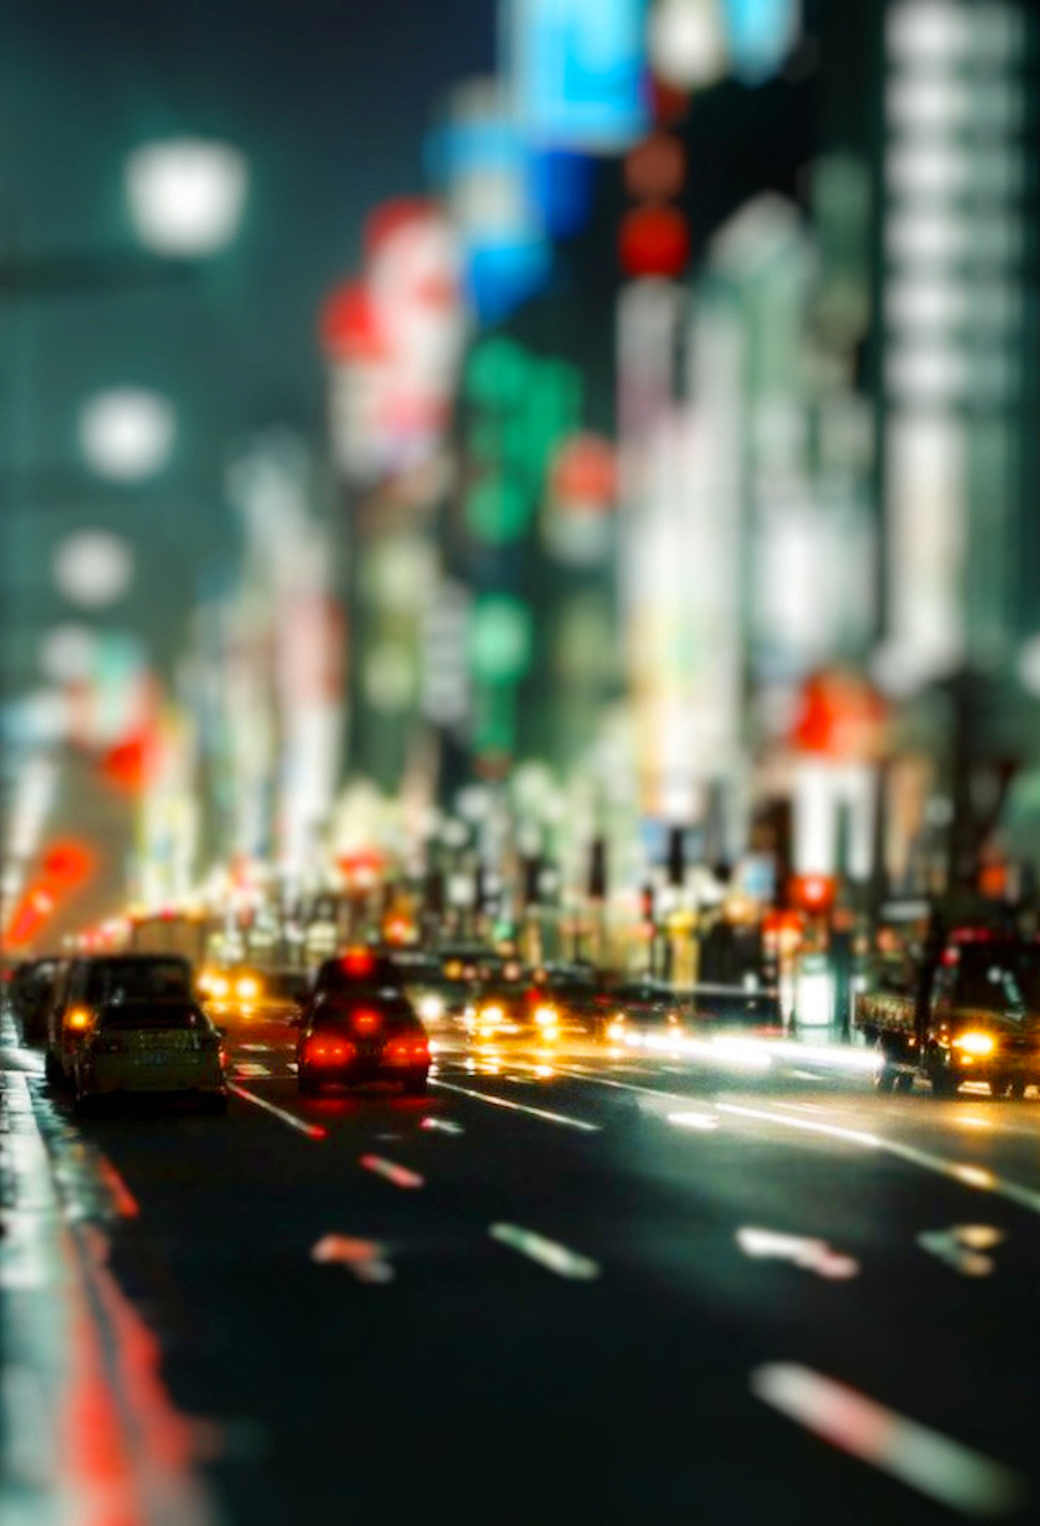 Street Lights 3Wallpapers IPhone Parallax